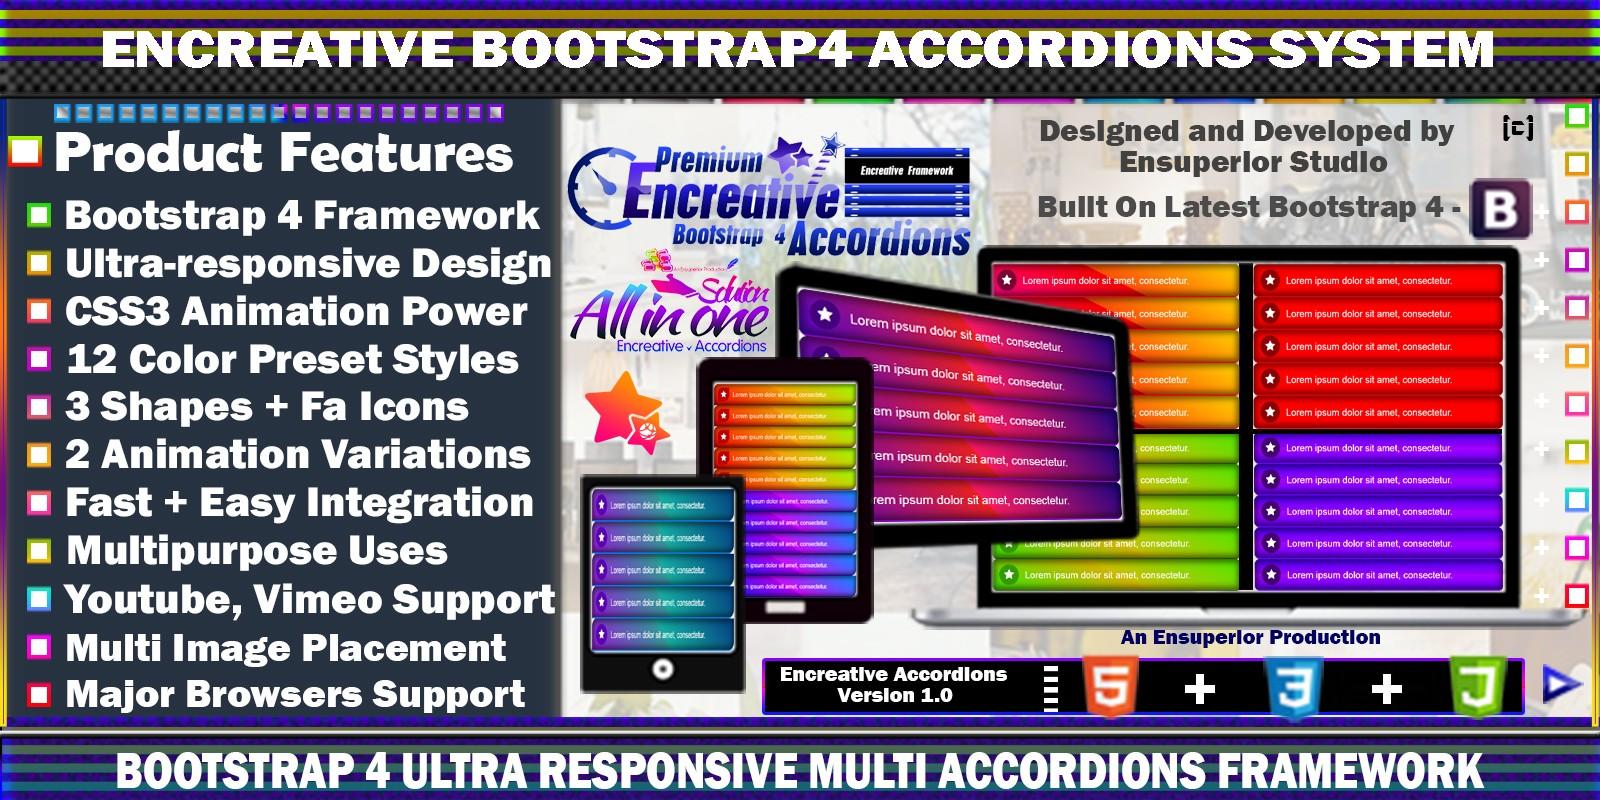 Encreative - Bootstrap 4 Accordions Framework